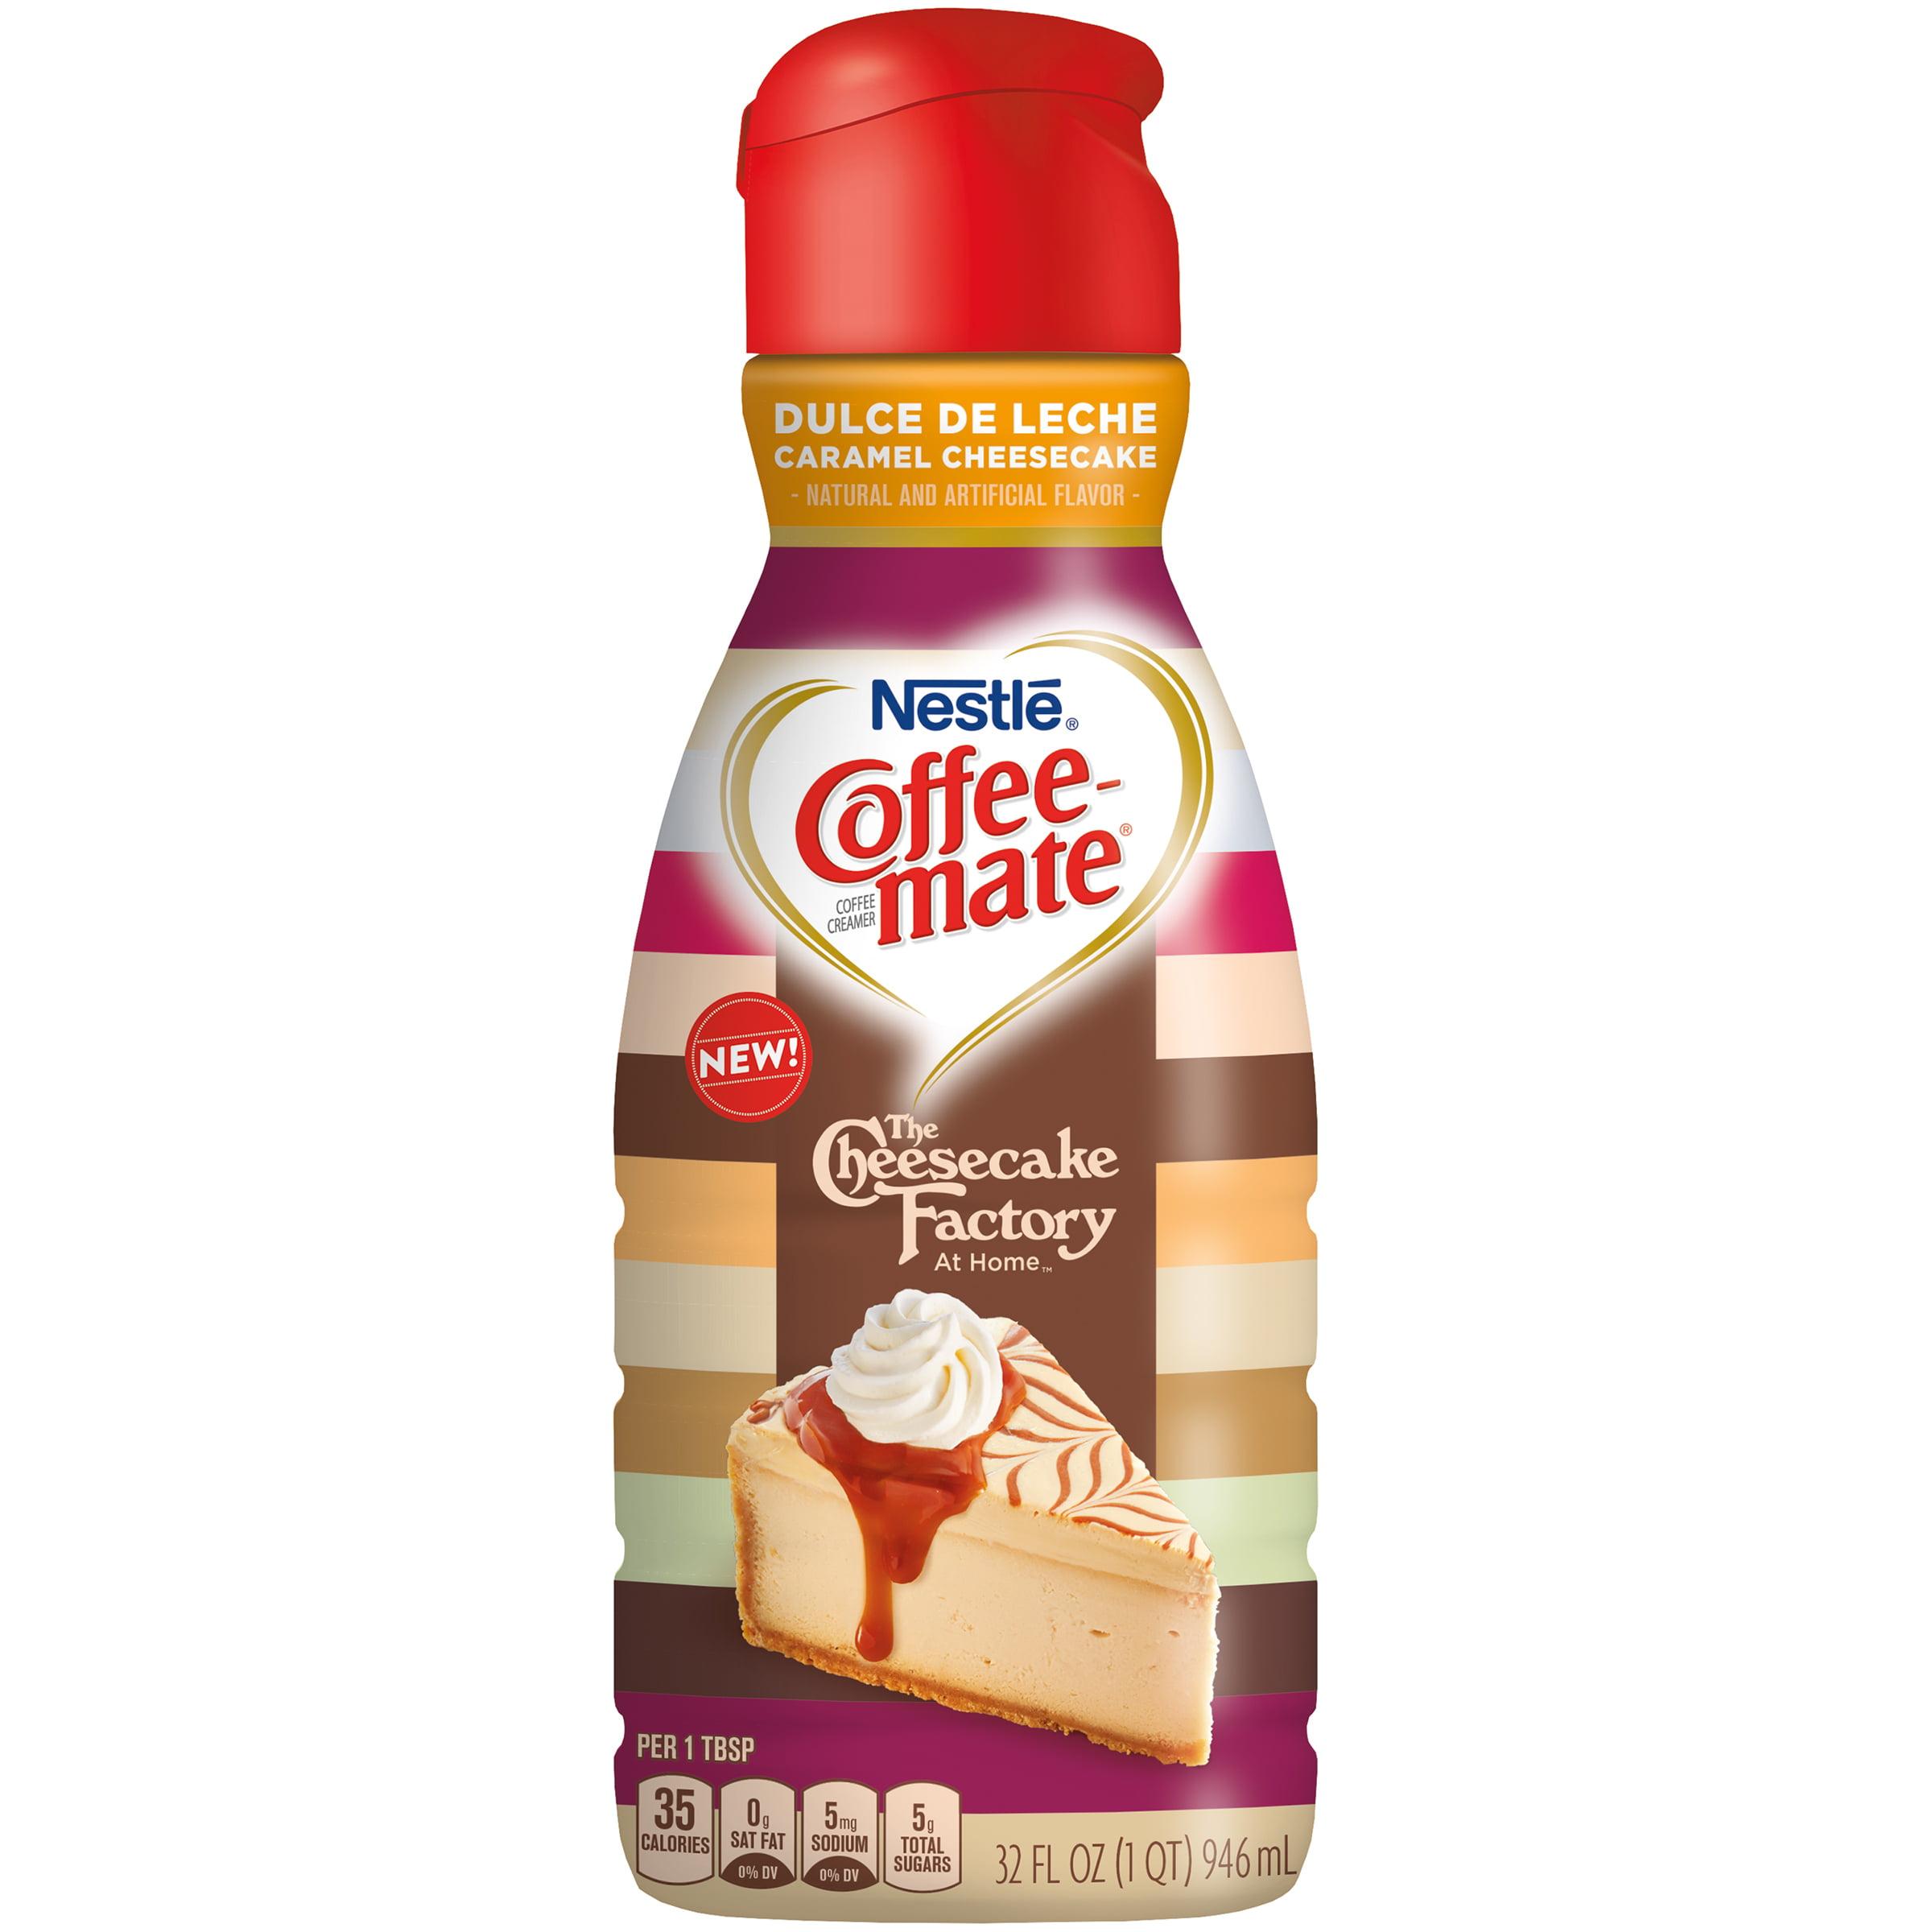 Coffee Mate The Cheesecake Factory At Home Dulce De Leche Cheesecake Liquid  Coffee Creamer 16 Fl. Oz.   Walmart.com